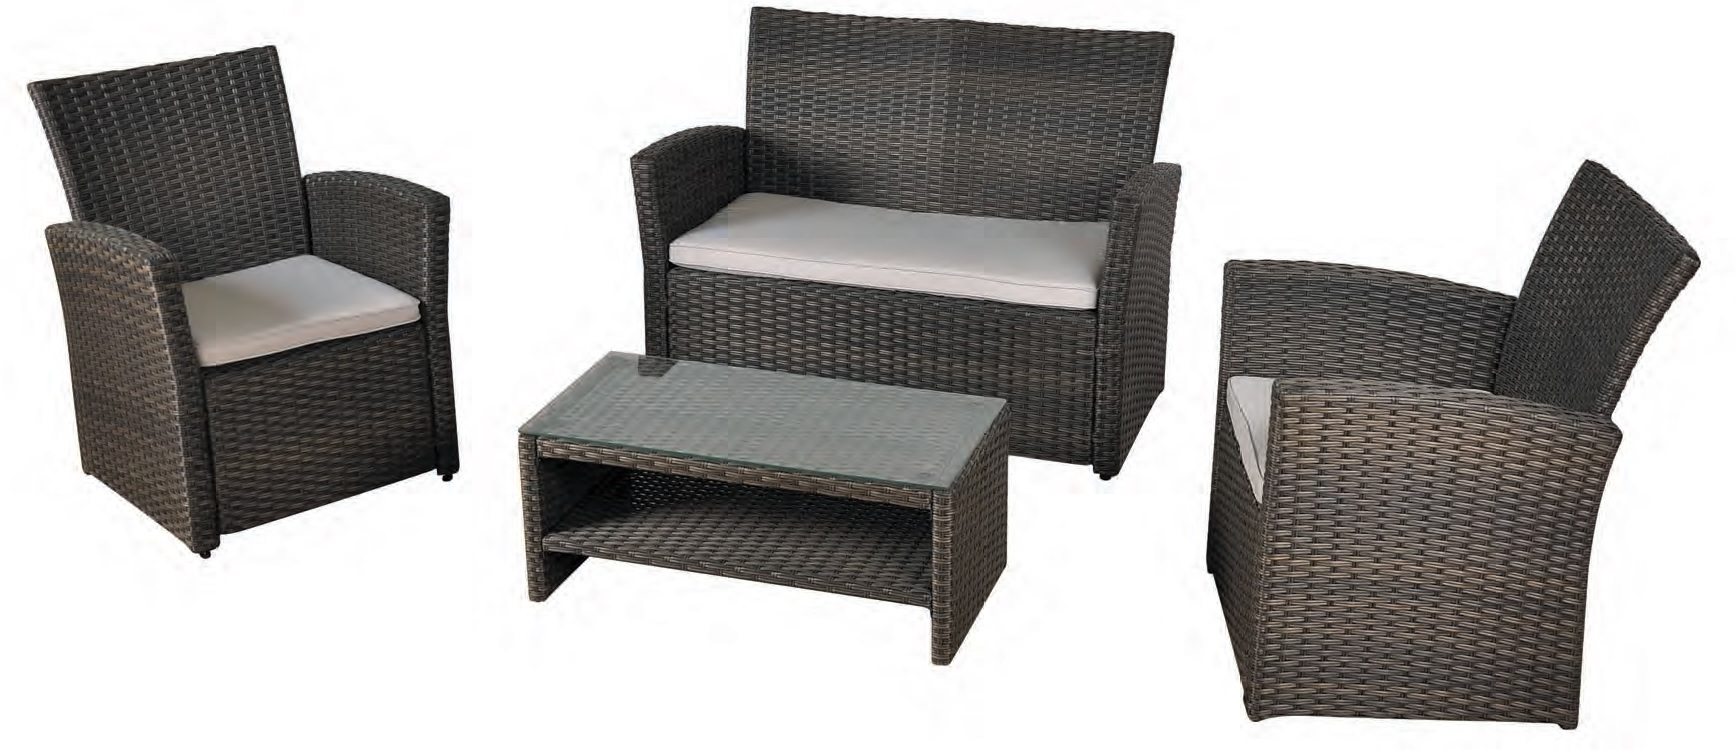 Set sofa terraza economico rattan oliver for Muebles de terraza de rattan